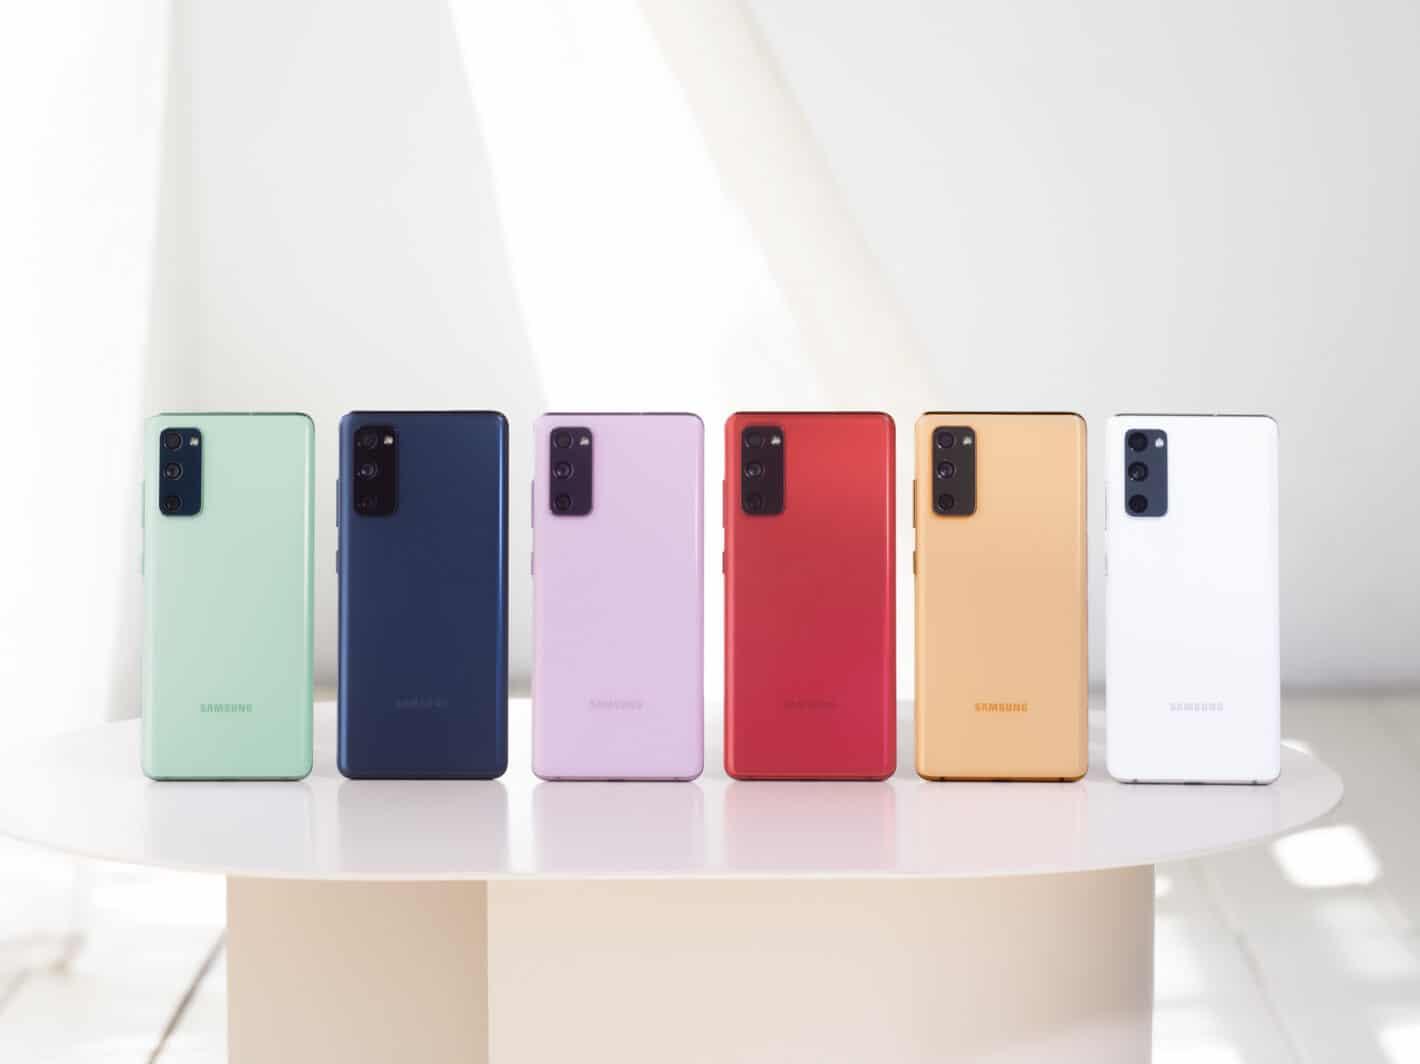 Galaxy S20 FE All Colors